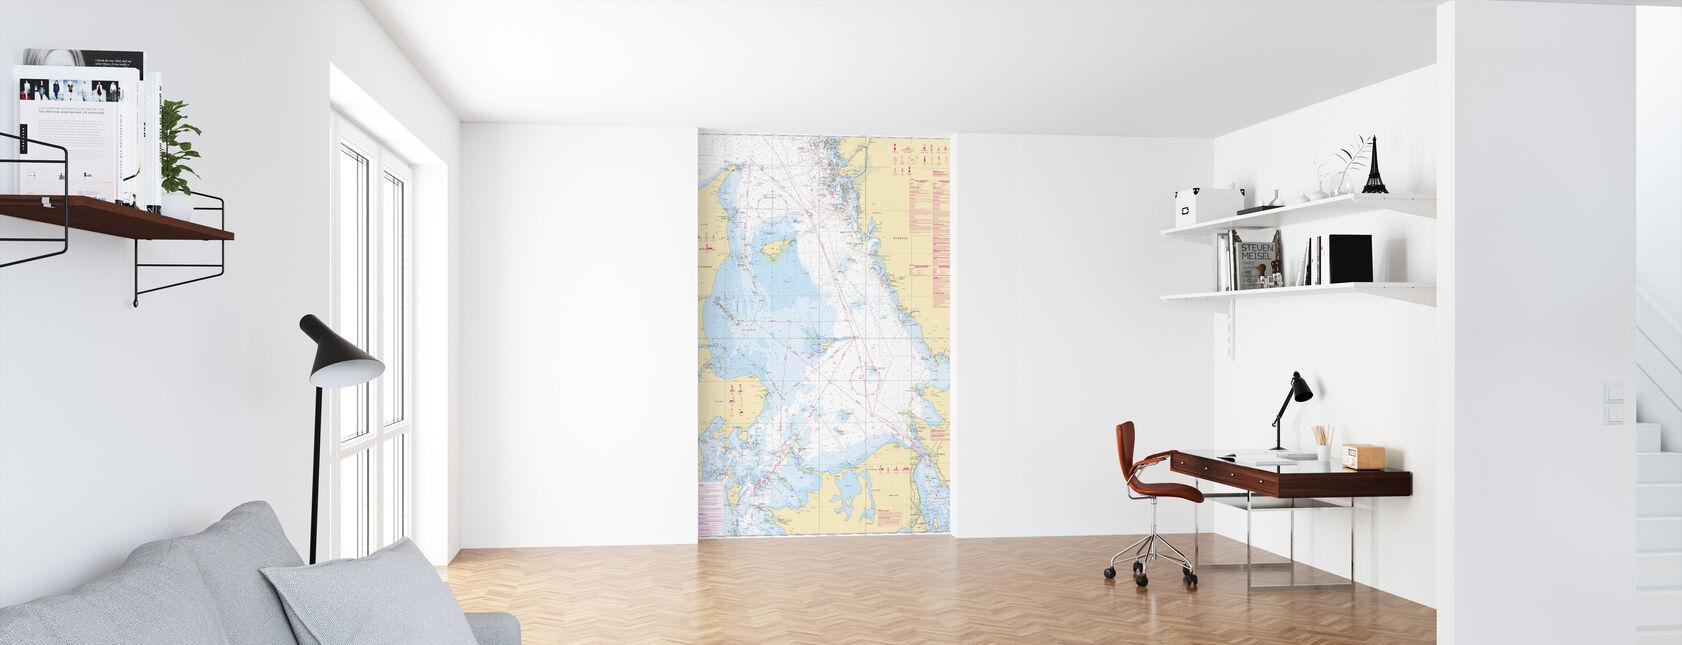 Sea Chart 92 - Kattegatt - Wallpaper - Office